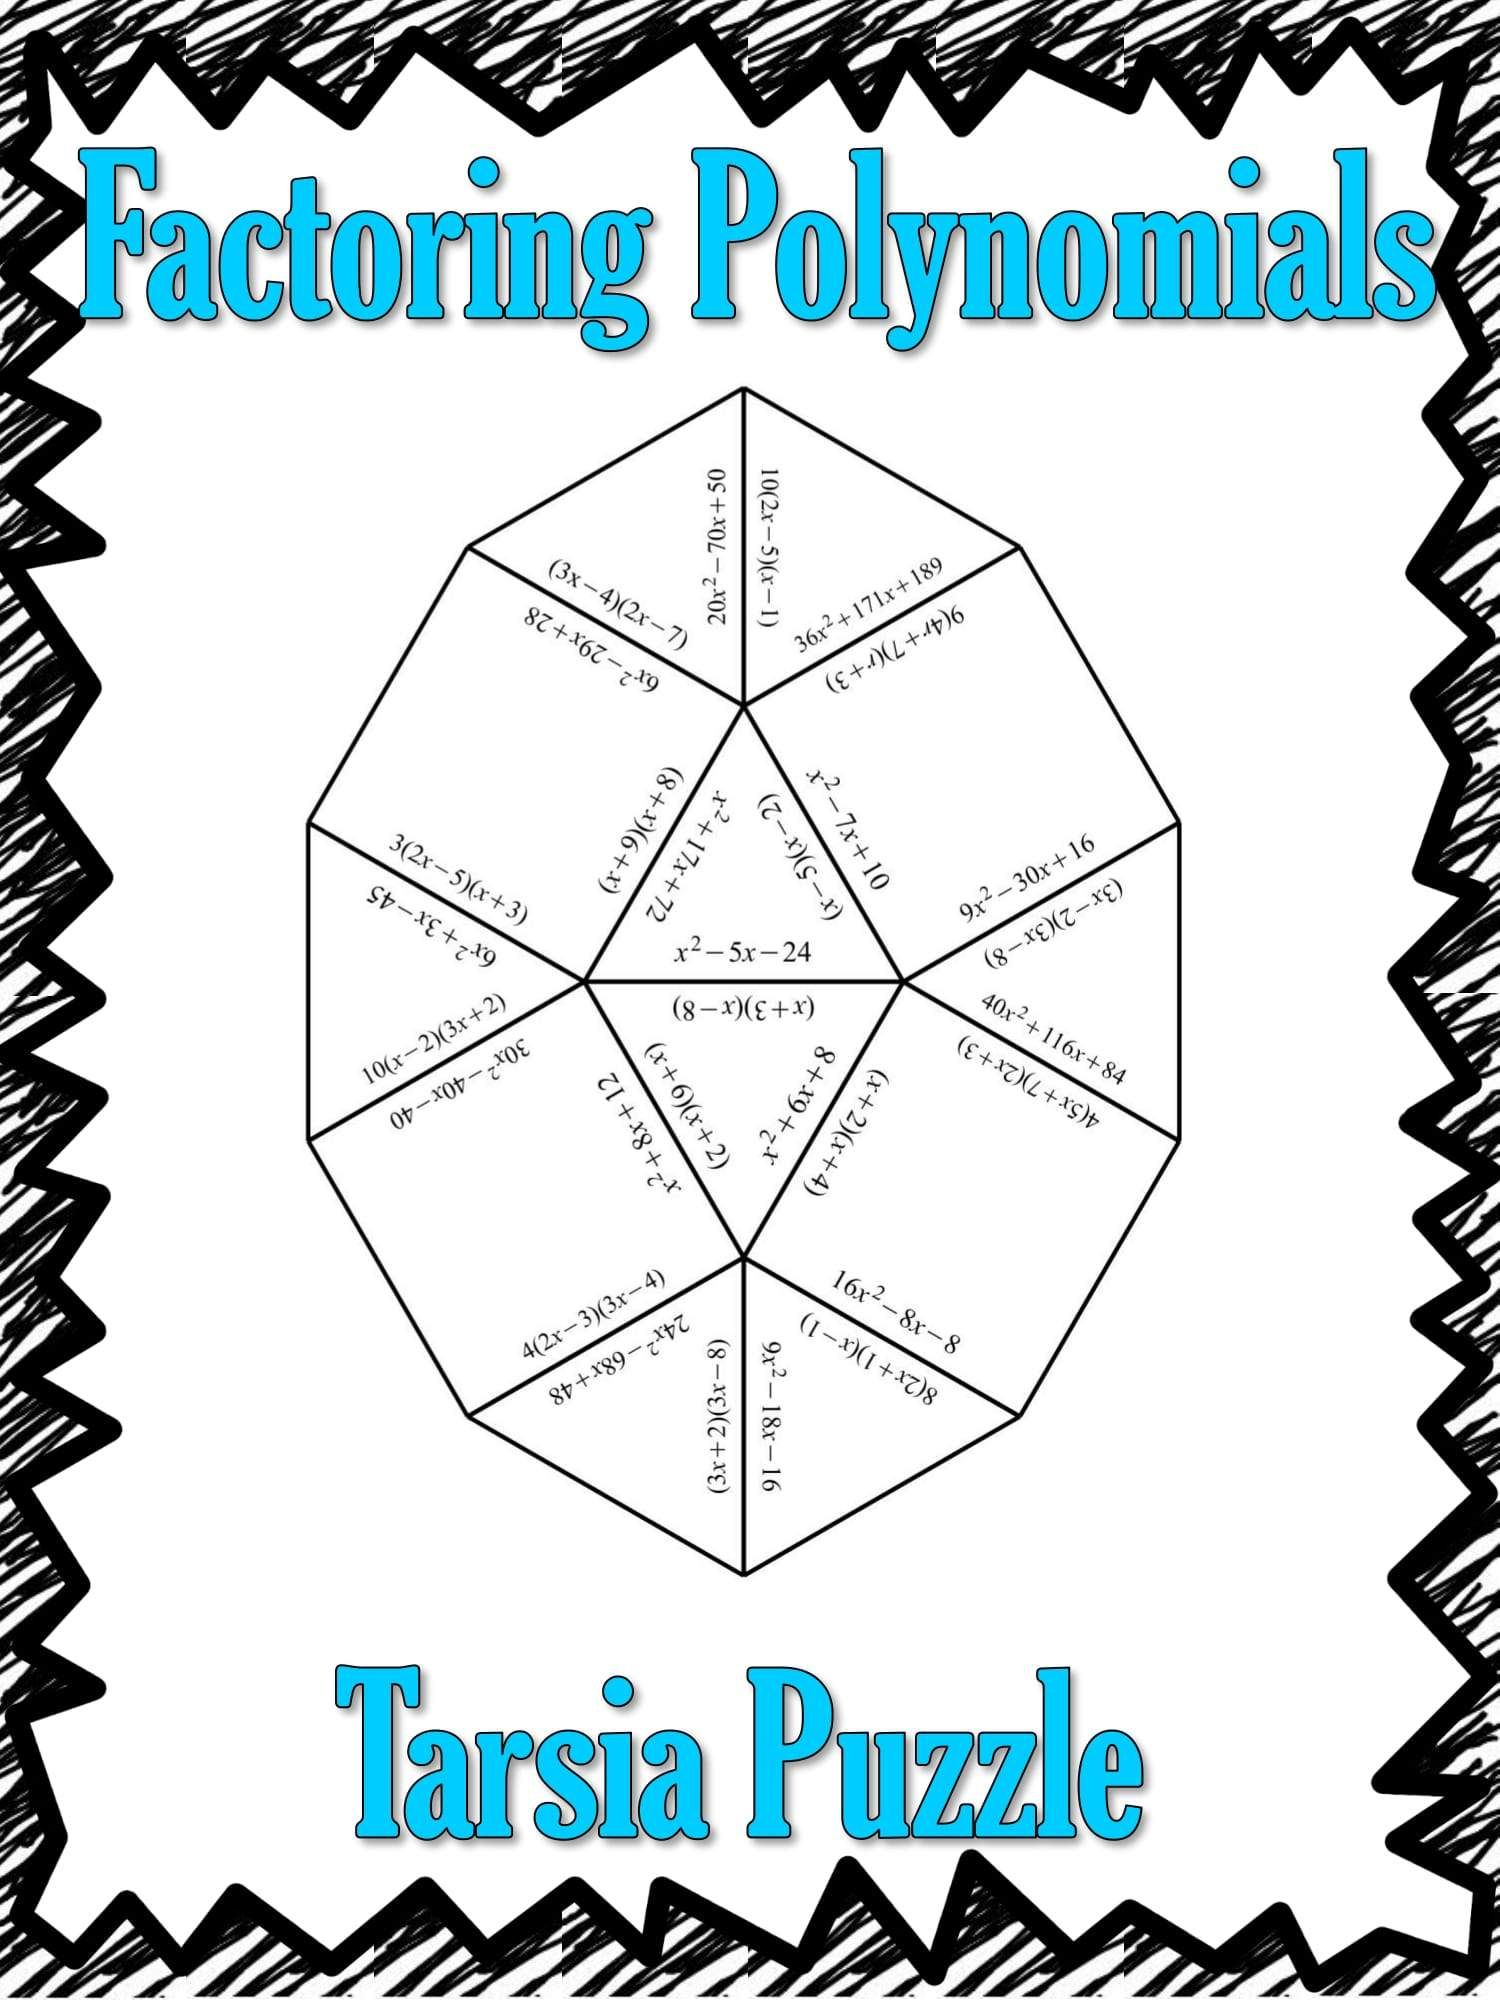 Factoring Polynomials Tarsia Puzzle Polynomials activity